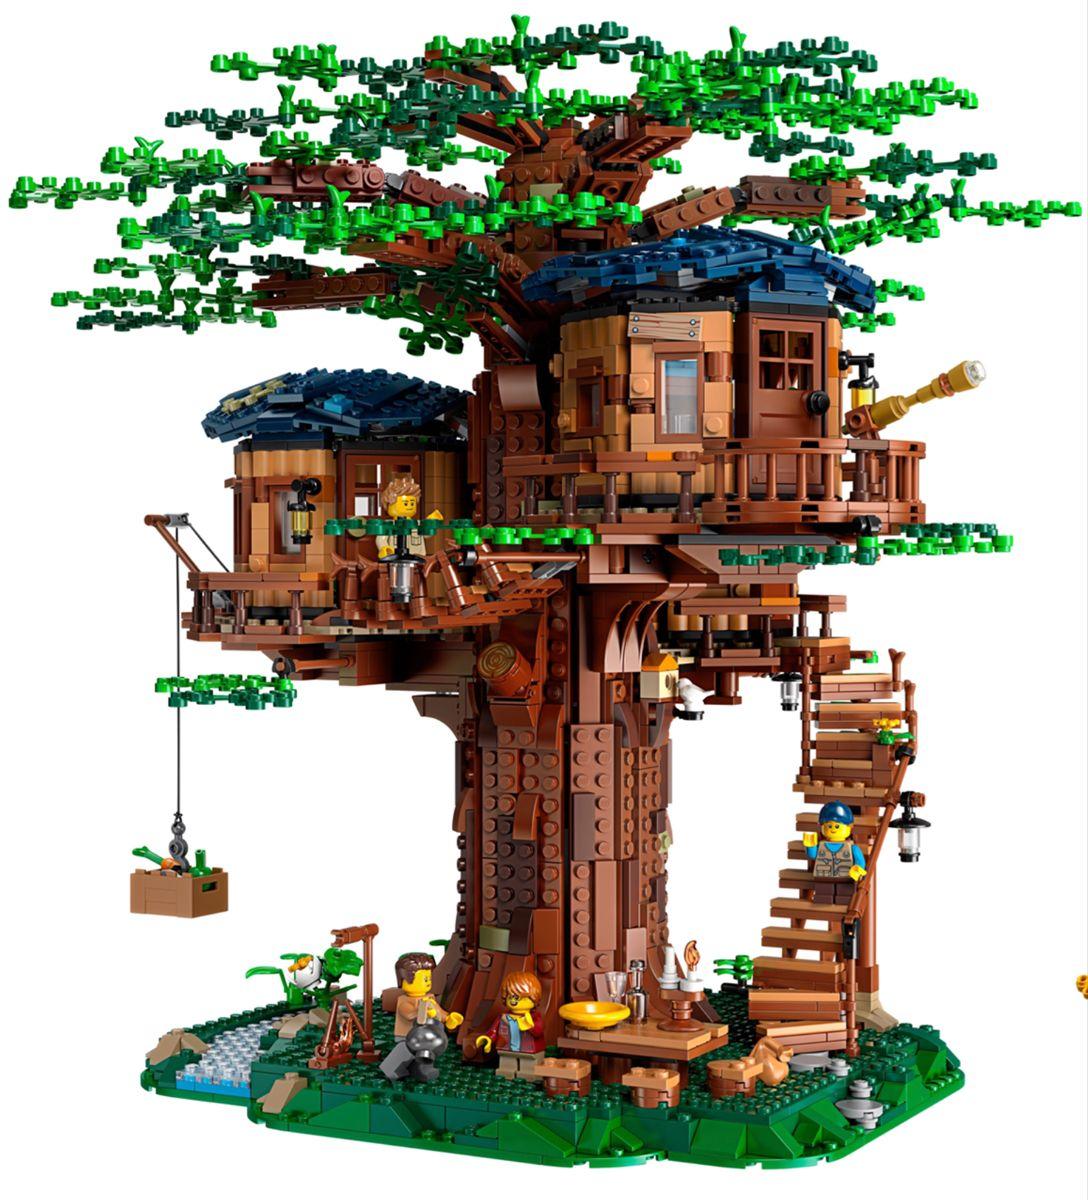 Pin By Heidi Hargreaves On Cutie Lego Tree House Tree House Lego Tree